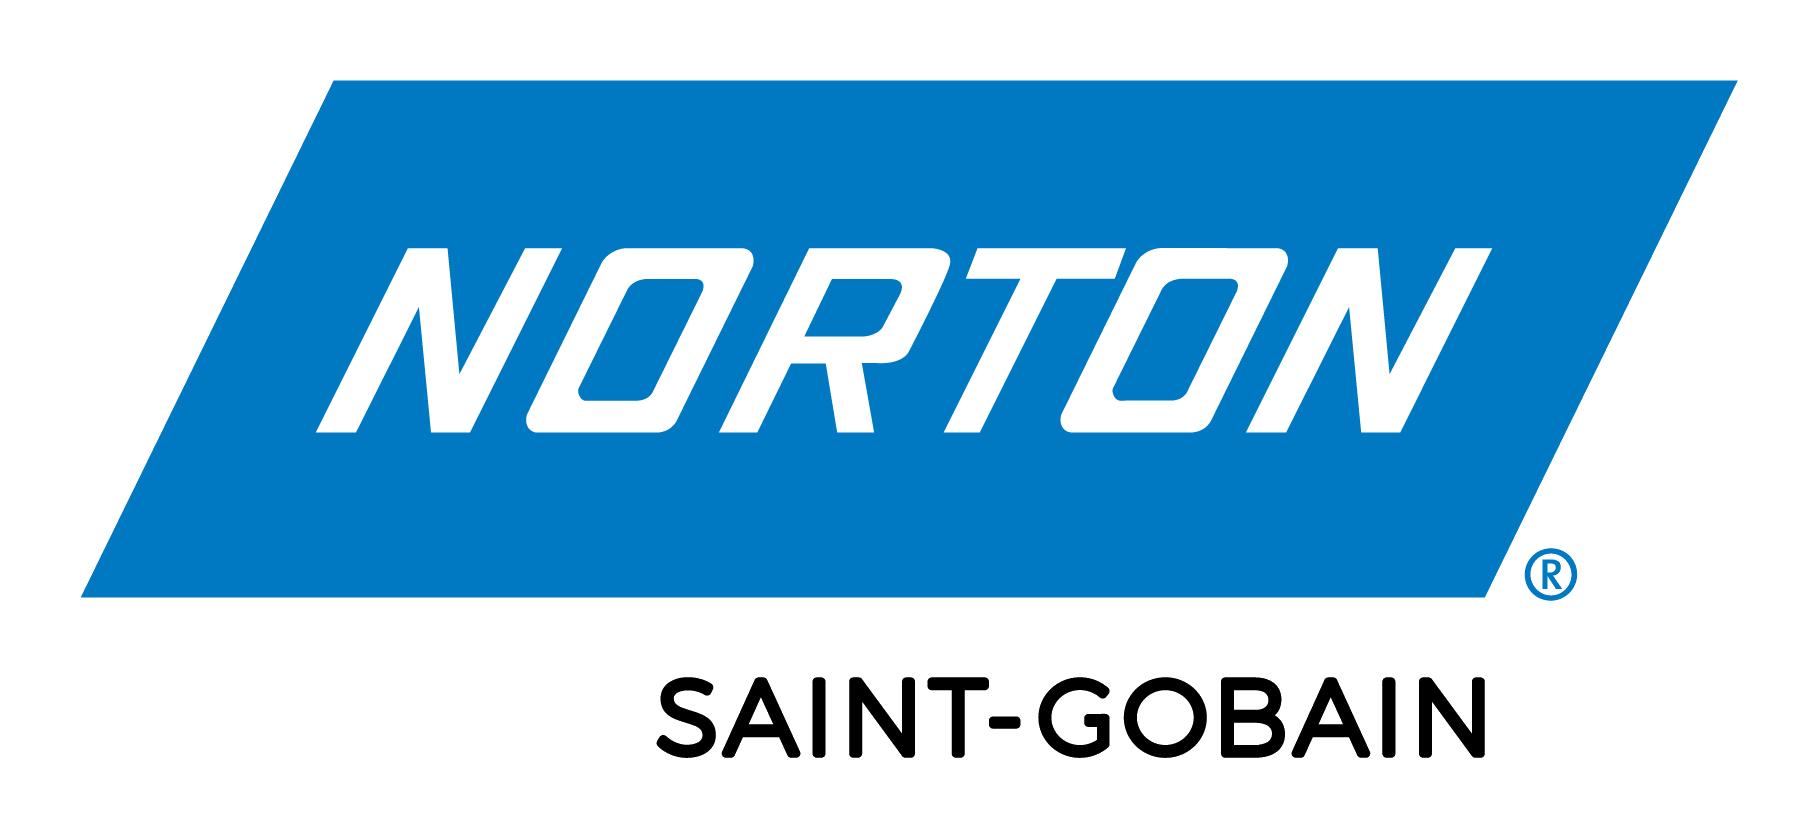 SG_Norton_logo_rgb_22